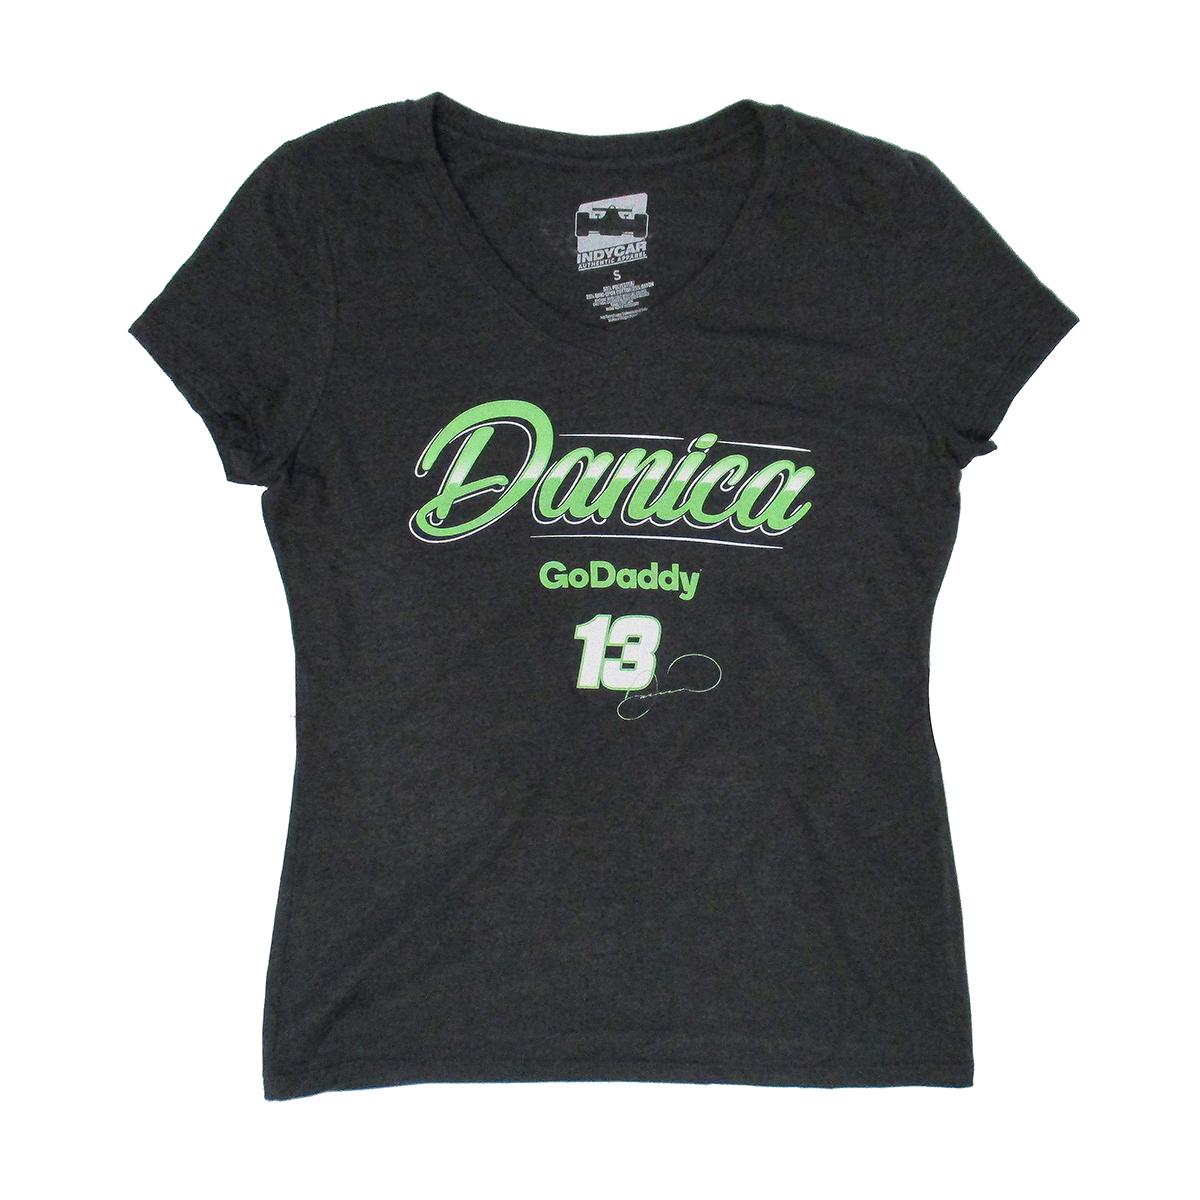 Danica Patrick 2018 INDY #13 GoDaddy Ladies T-shirt